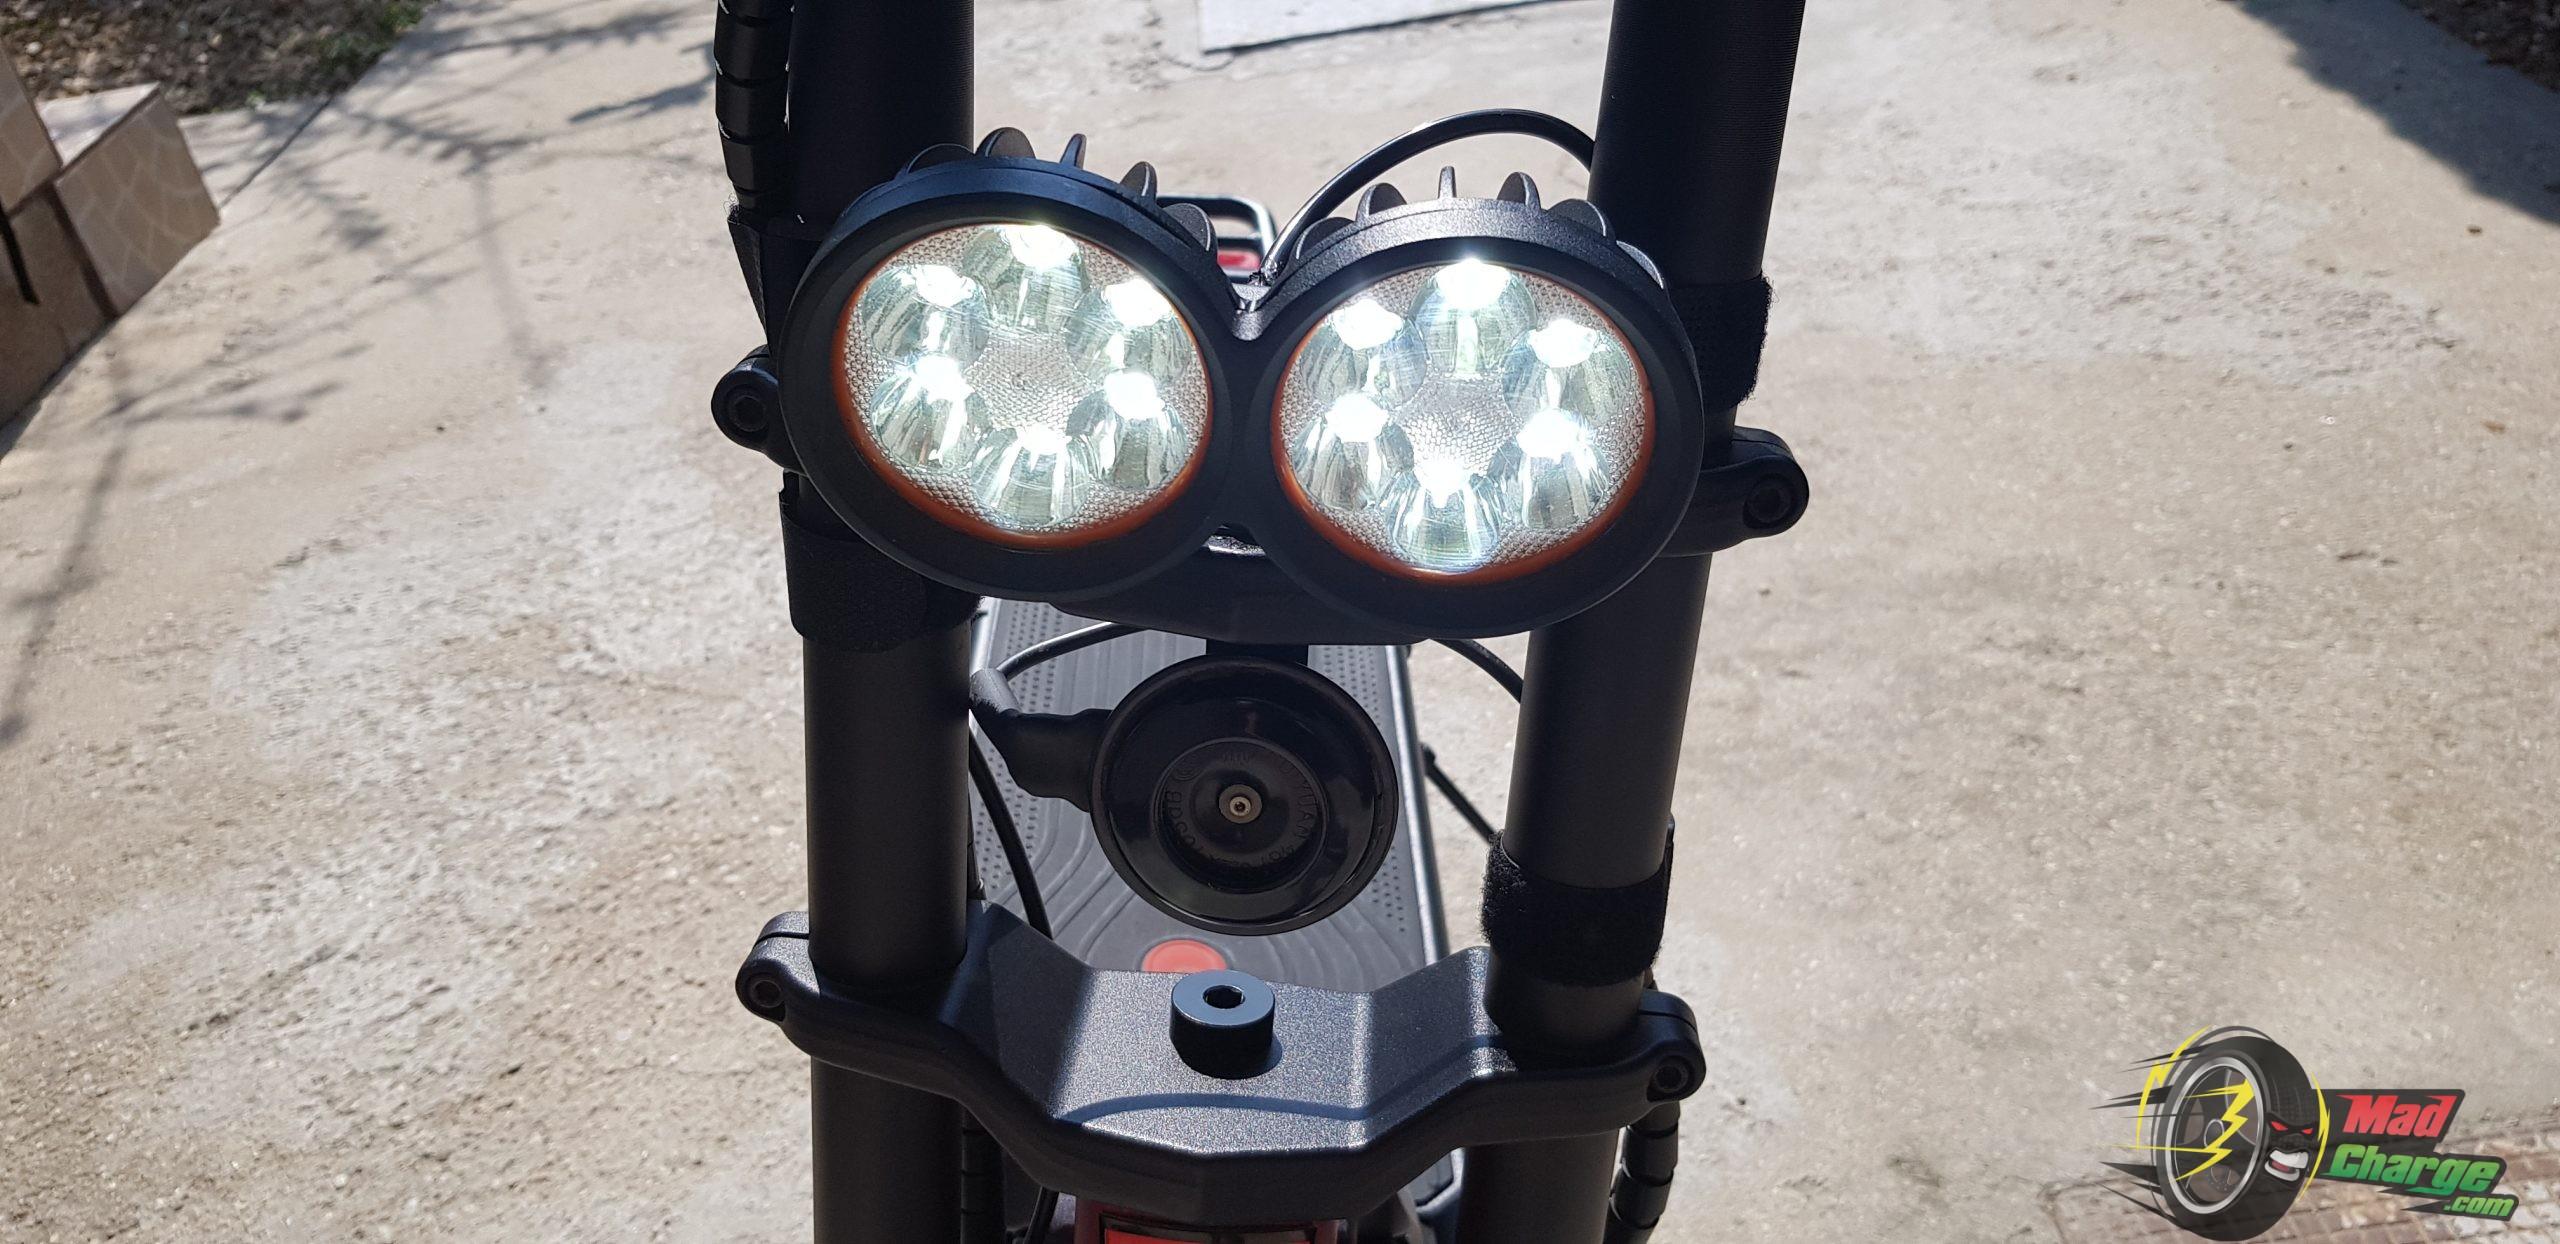 Kaabo Wolf Warrior II Front Lights ON